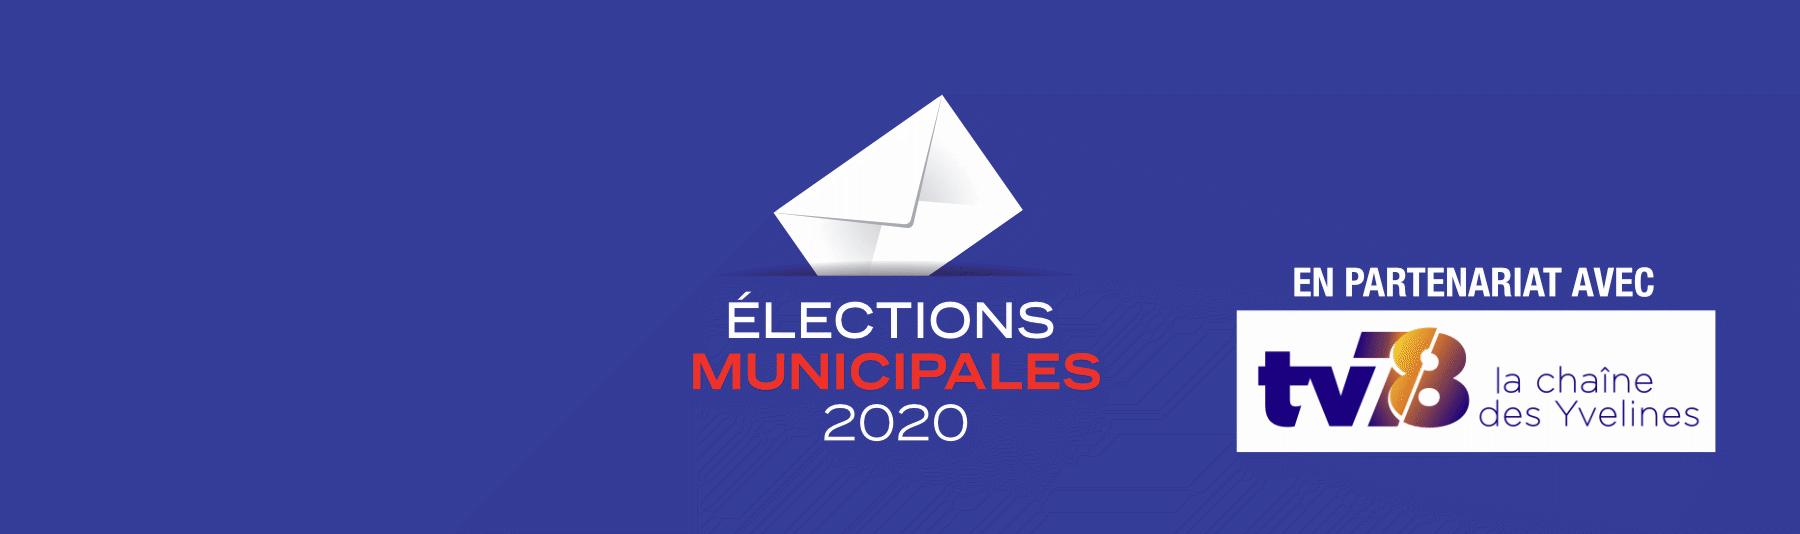 MUNICIPALES 2020 YVELINES